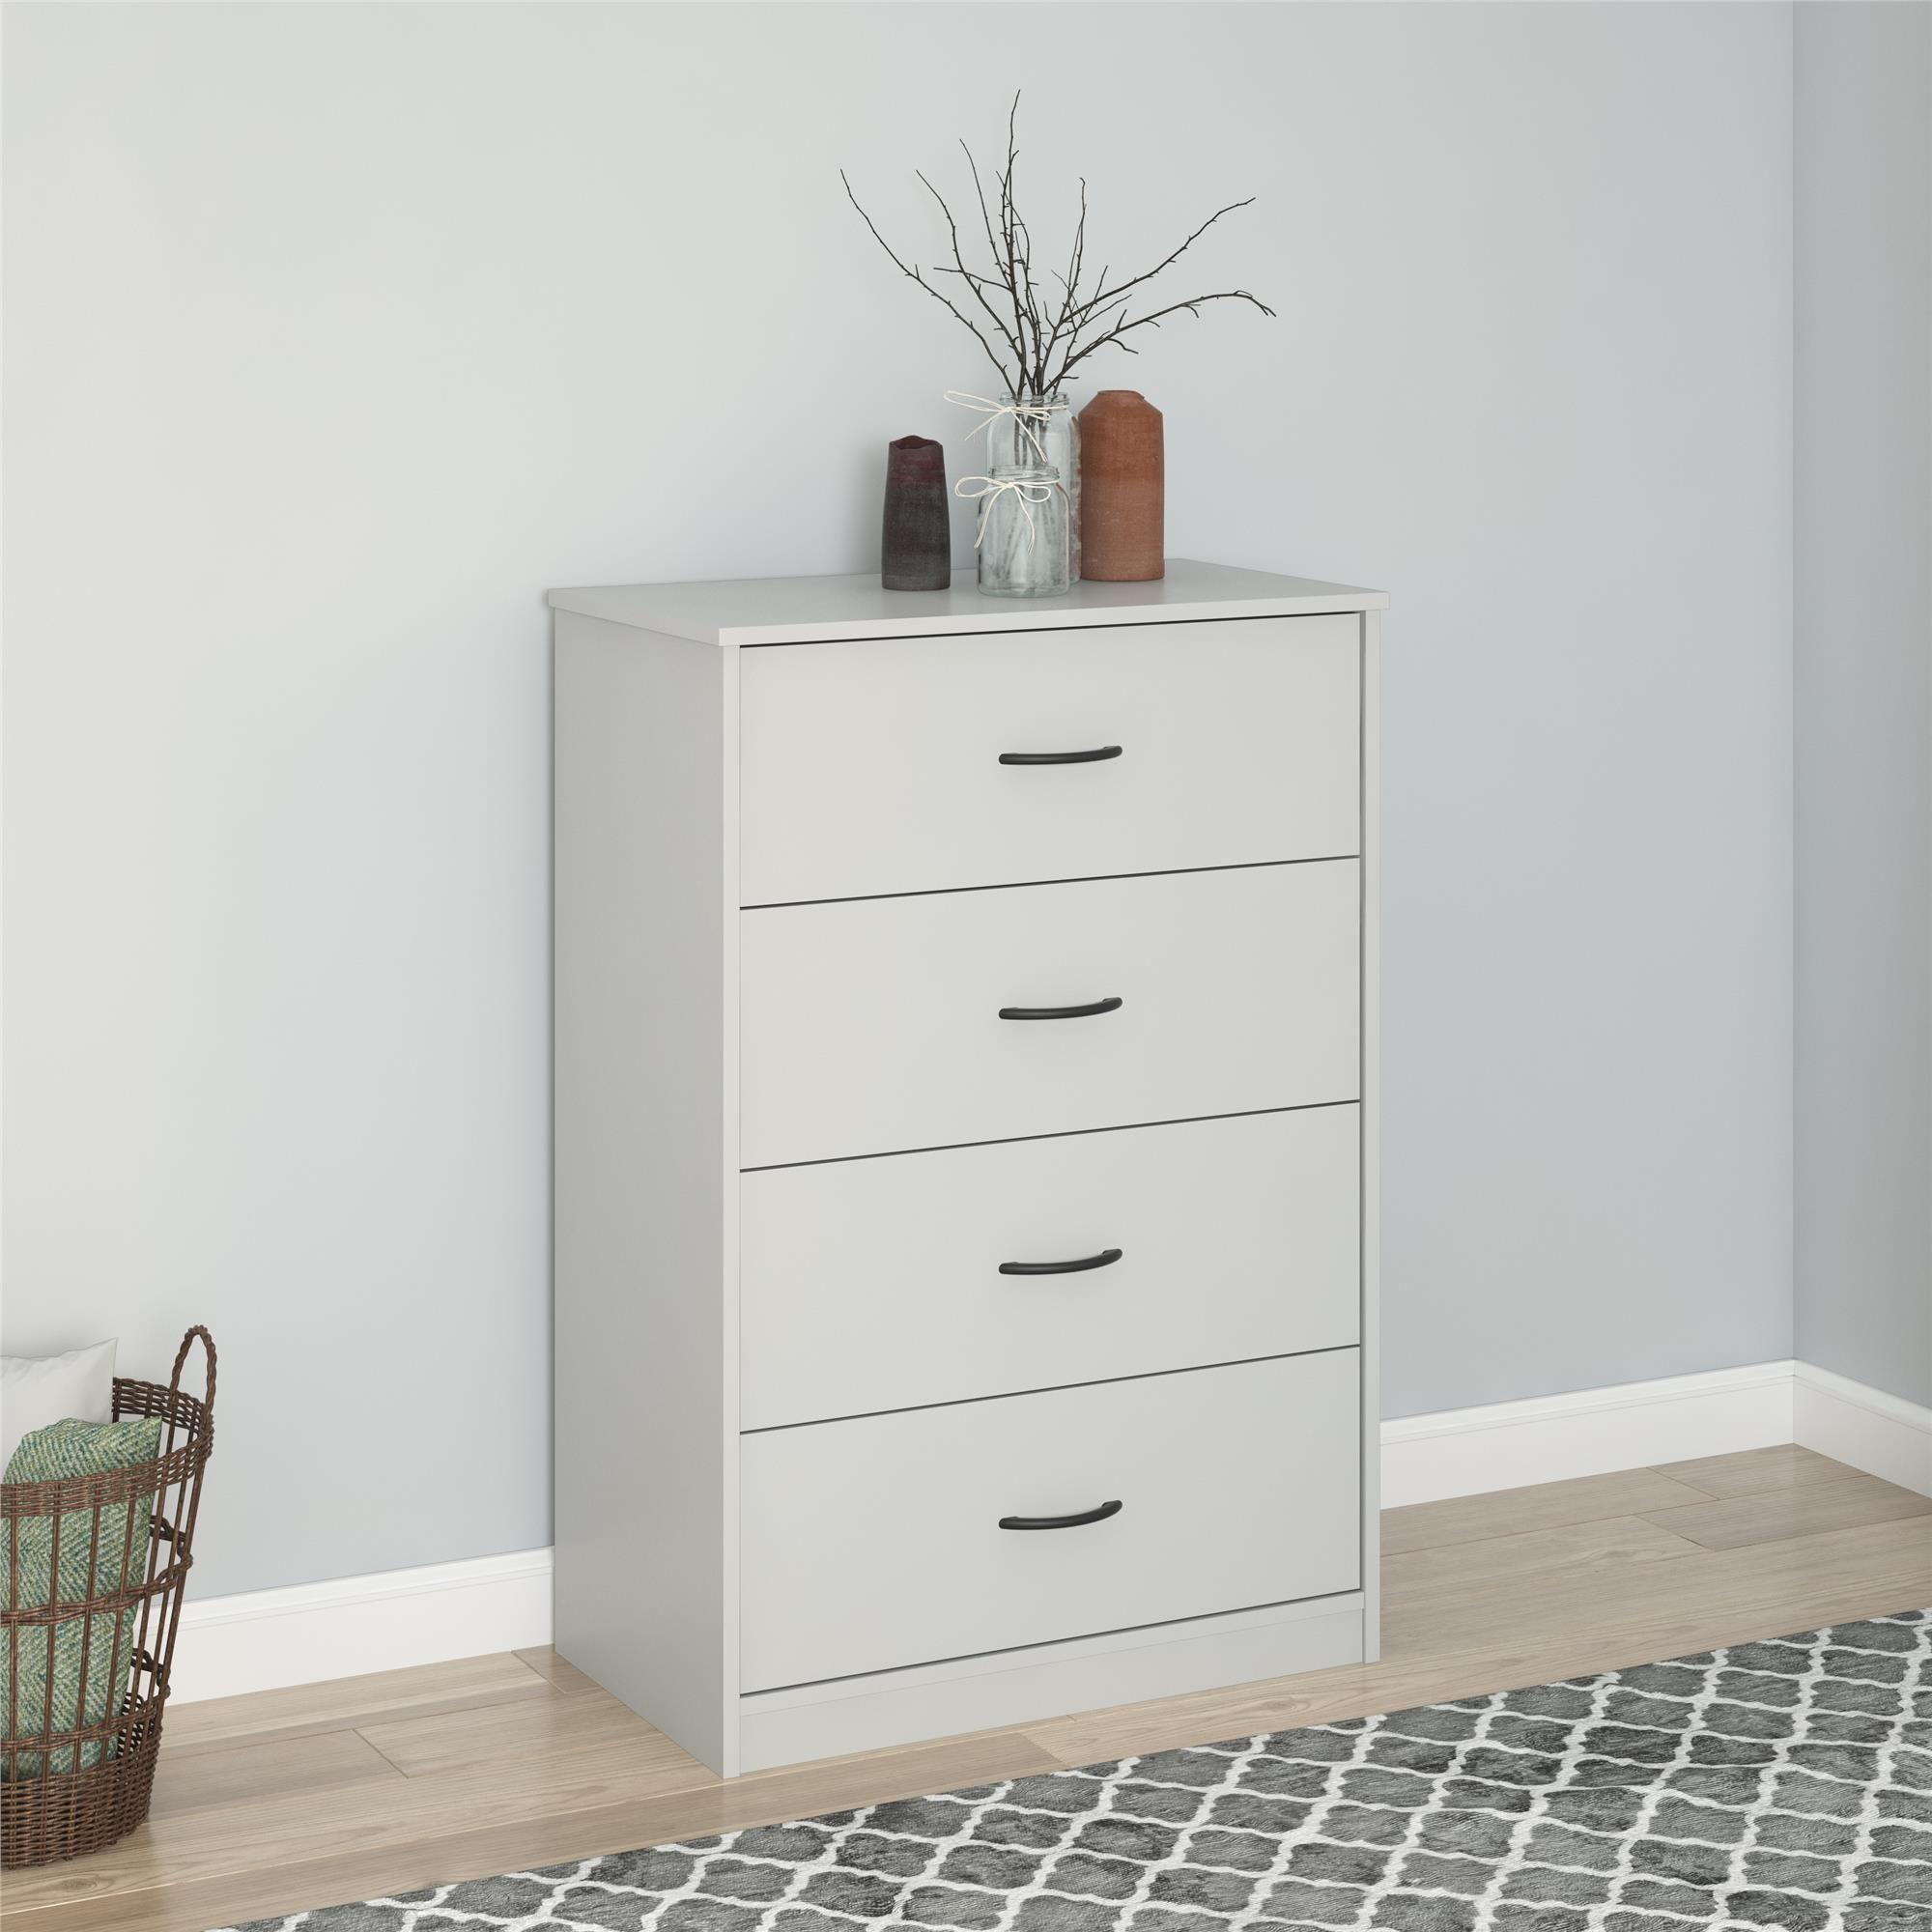 Mainstays Classic 4 Drawer Dresser Espresso Finish Walmart Com Modern Bedroom Storage Storage Furniture Bedroom Modern Dresser